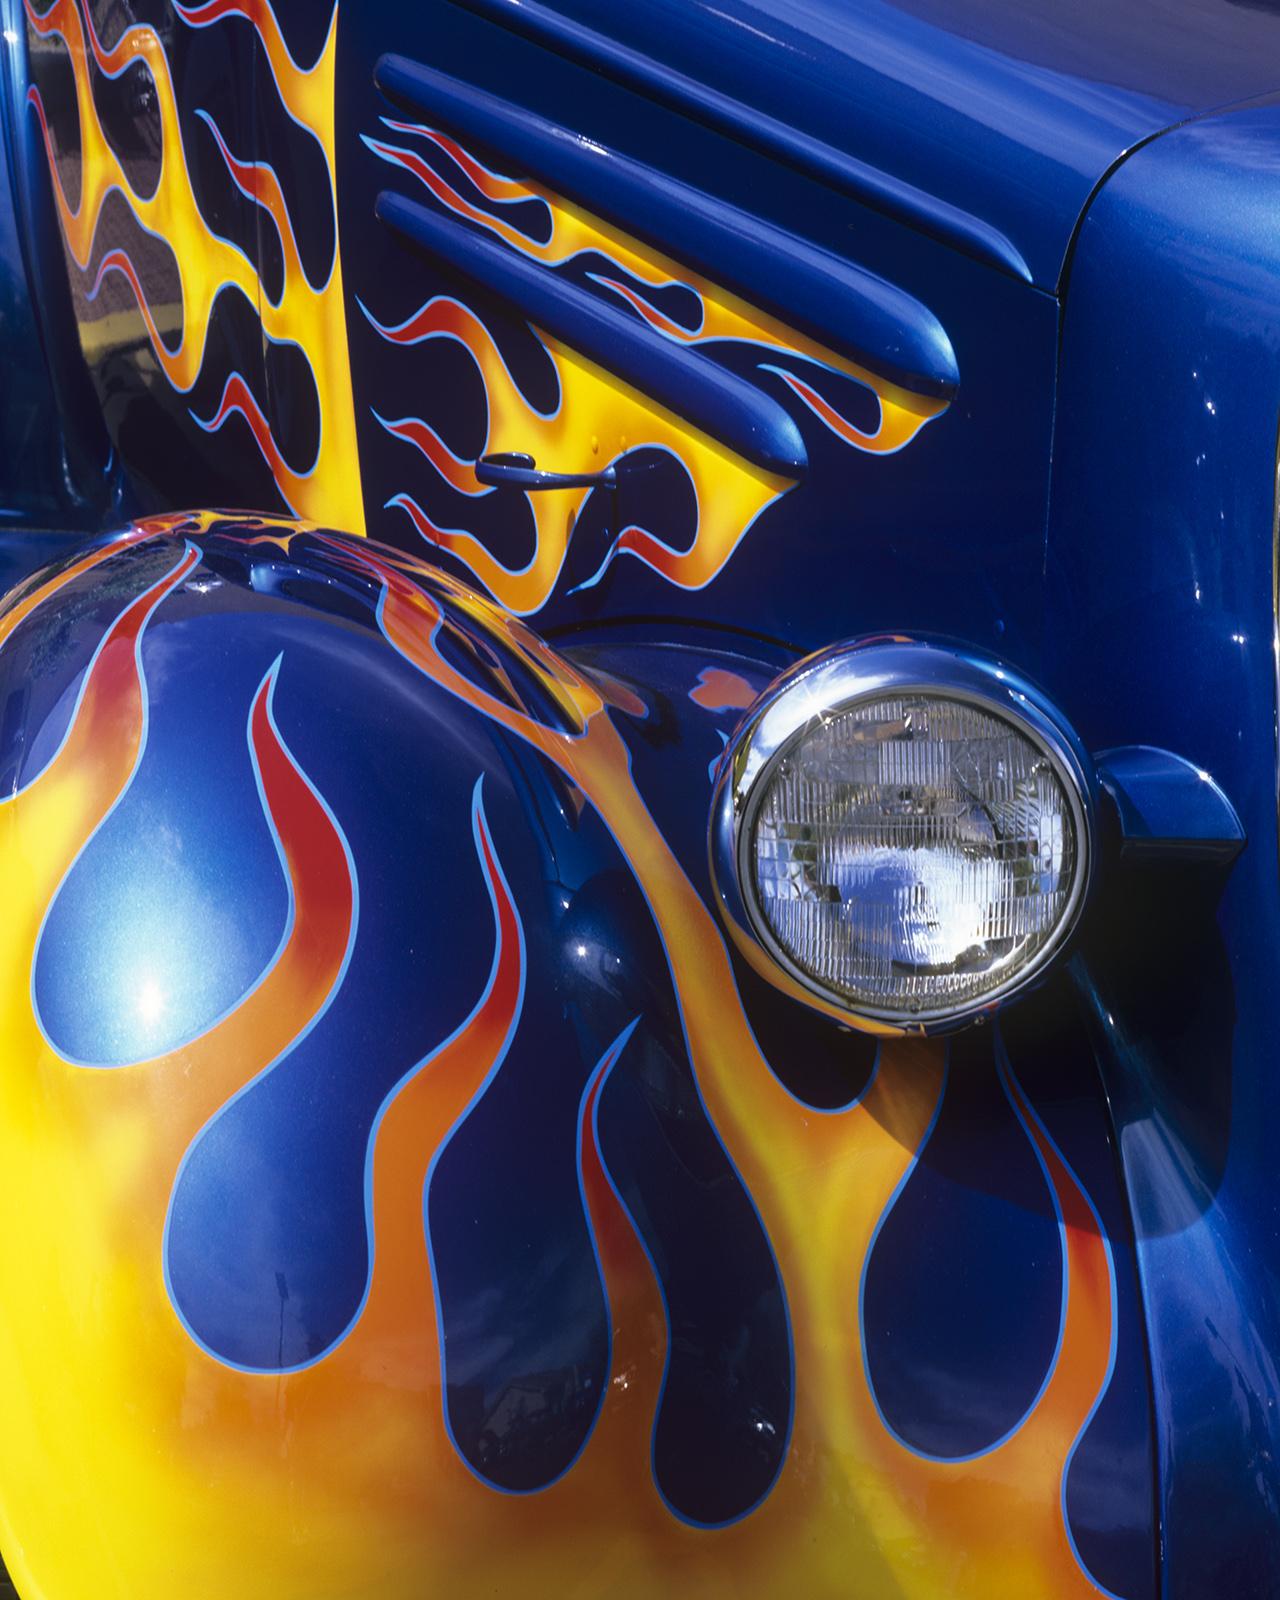 1936, chevy, chevrolet, coupe, flatback, flames, paint, blue, show car, hot rod, good guys, barrett jackson, collector car, details, abstract, headlight, headlamp, photo